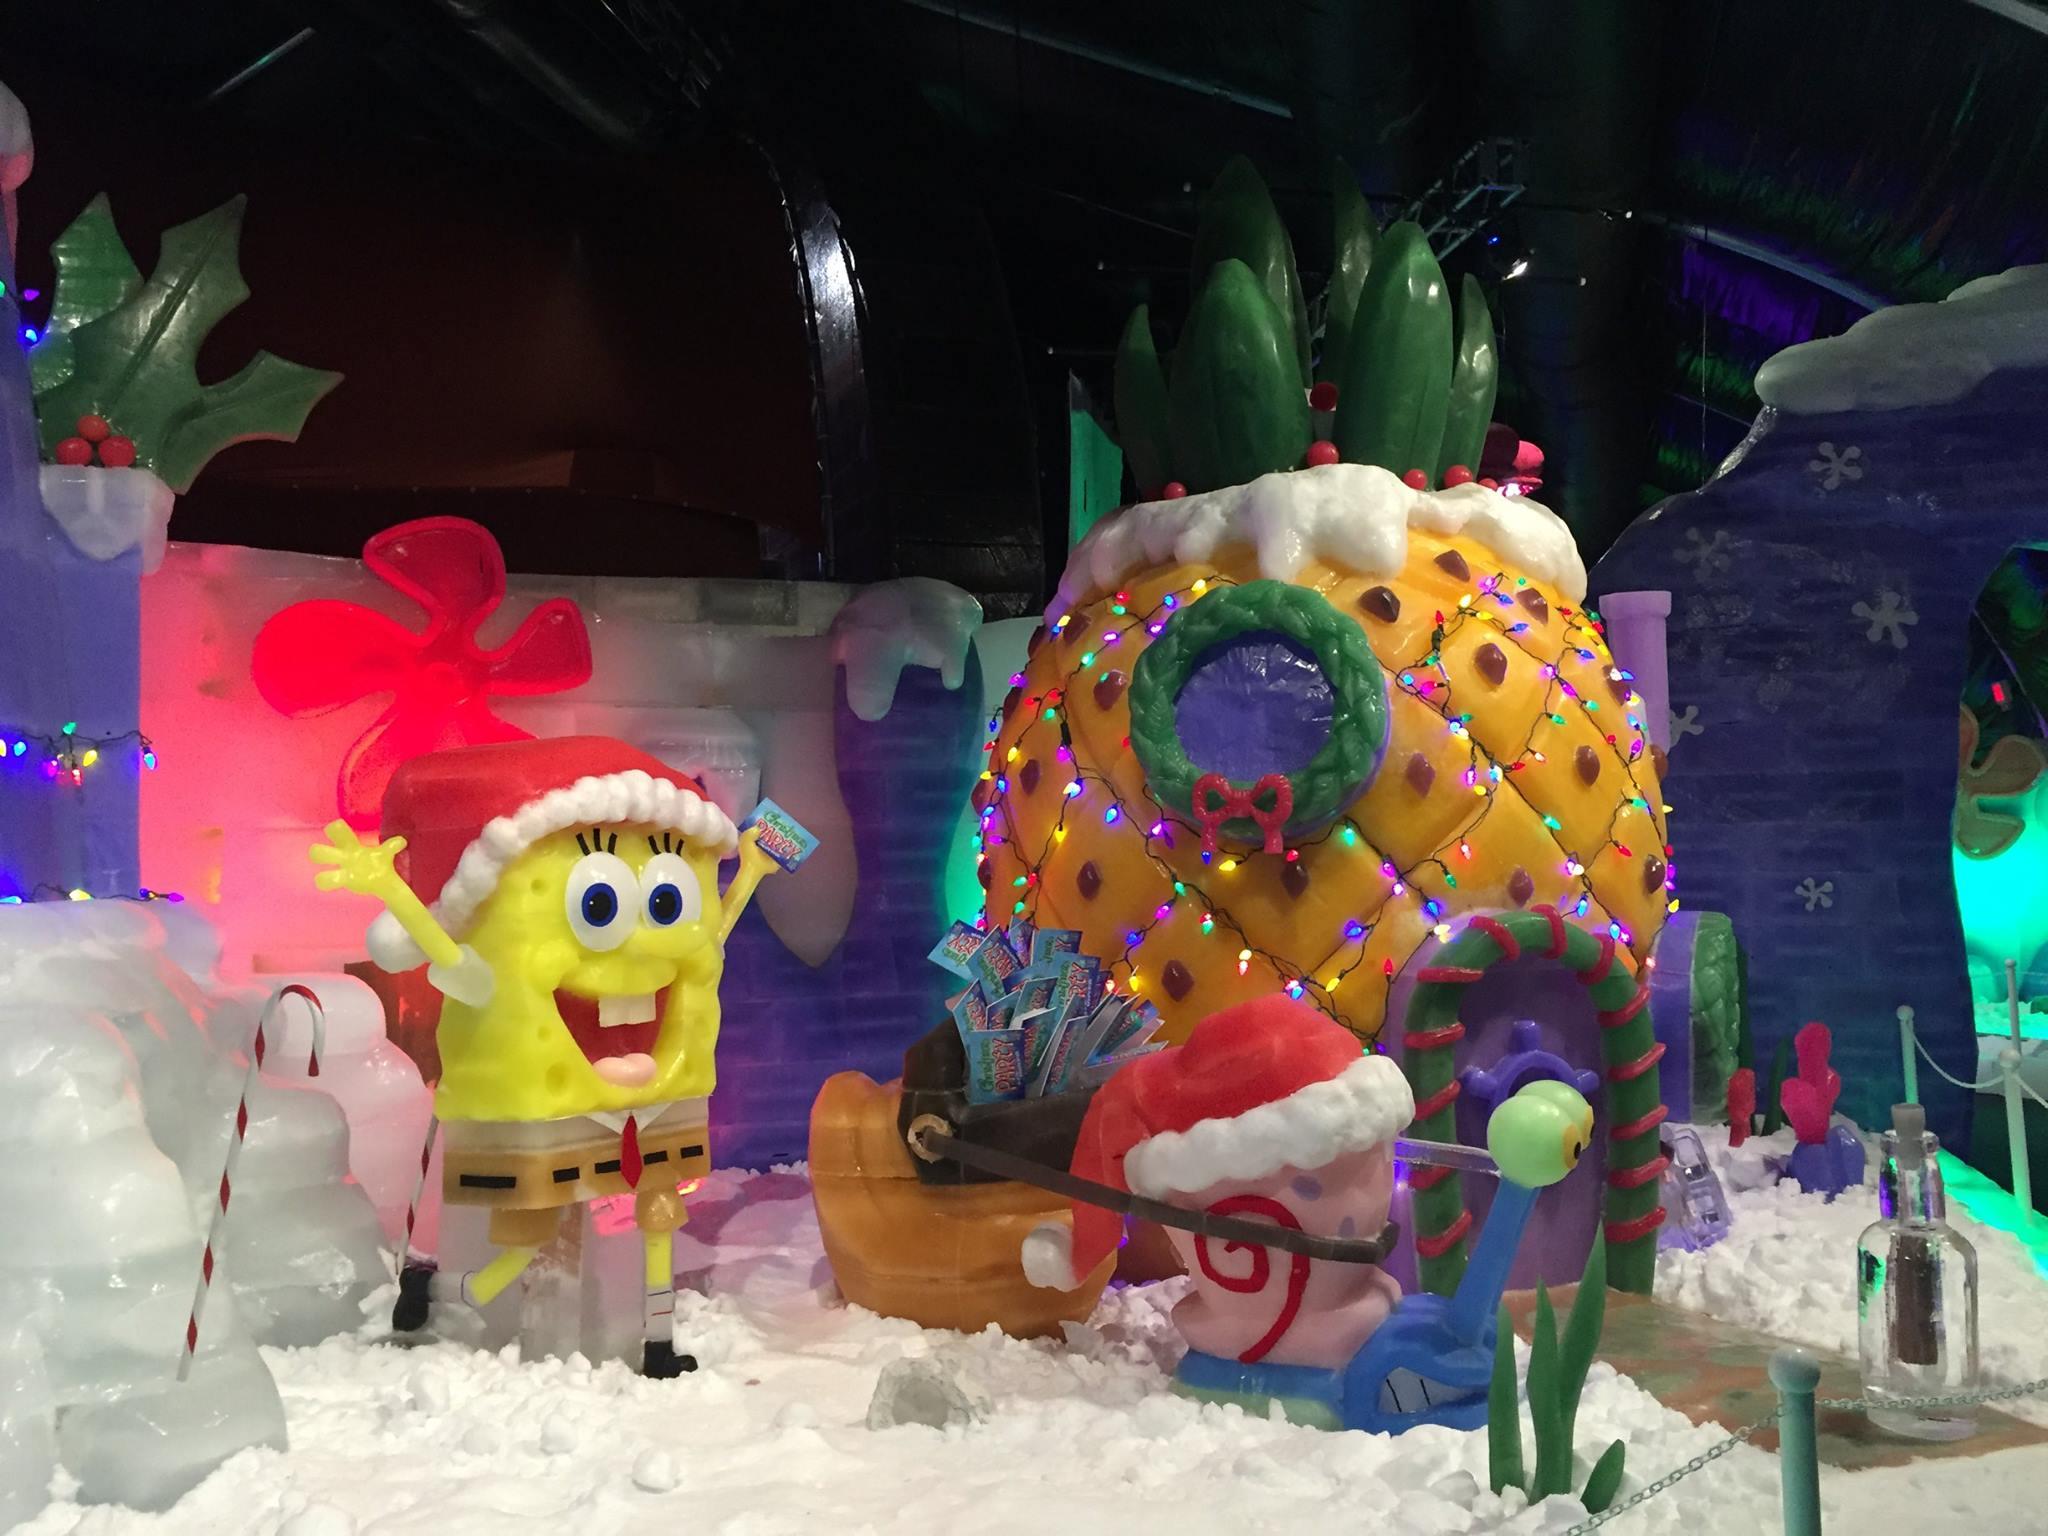 SpongeBob Iceland Christmas Pineapple